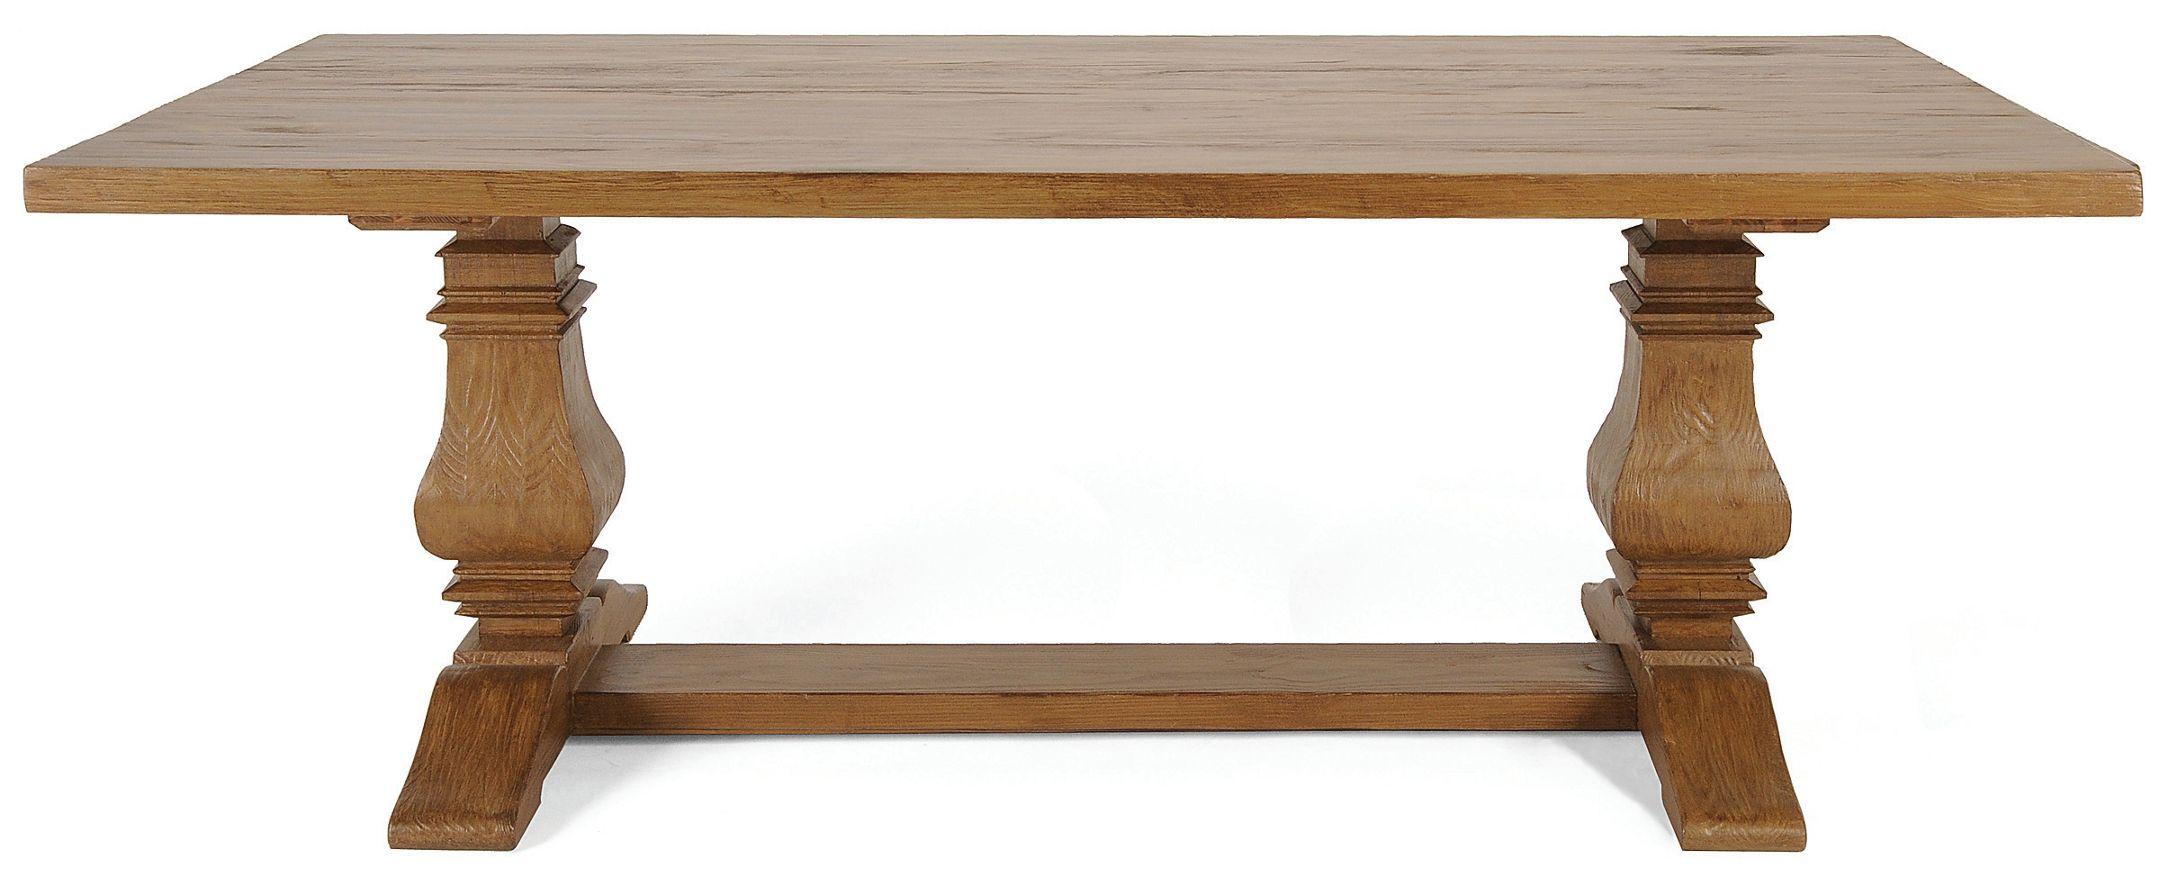 Lane Tyden Dining Table Dimensions 30 H X 84 W 42 D Custom